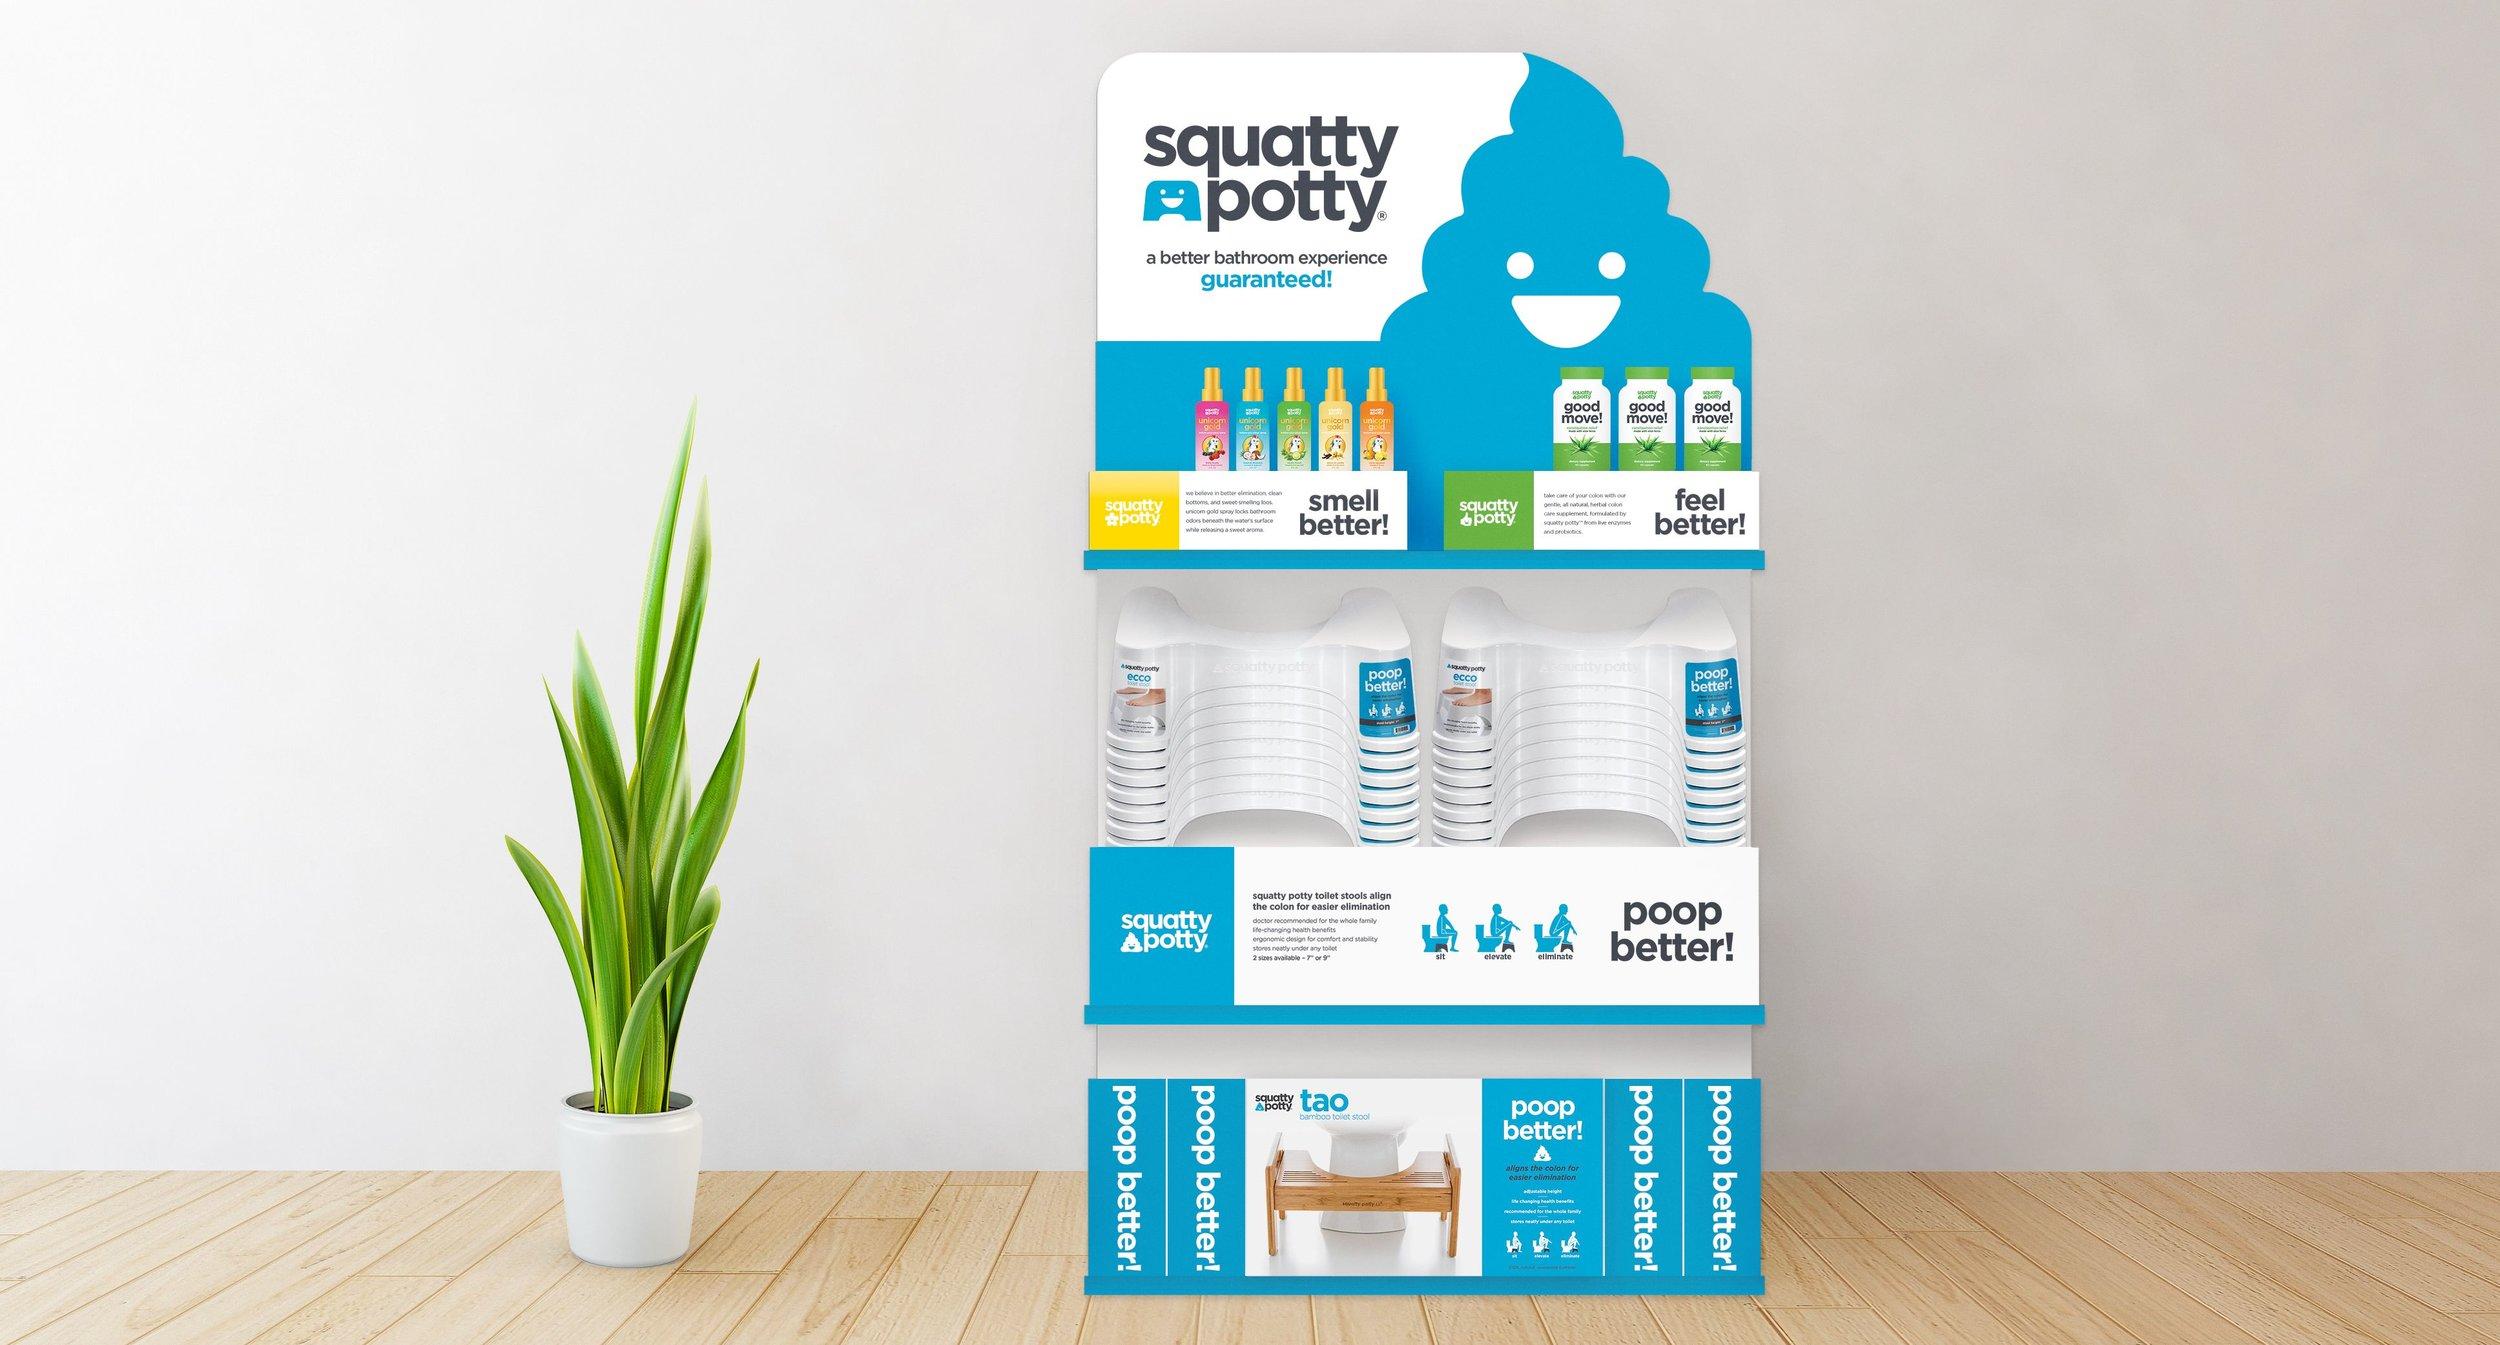 bf27ffa15ea Squatty Potty Stool and Spray Display